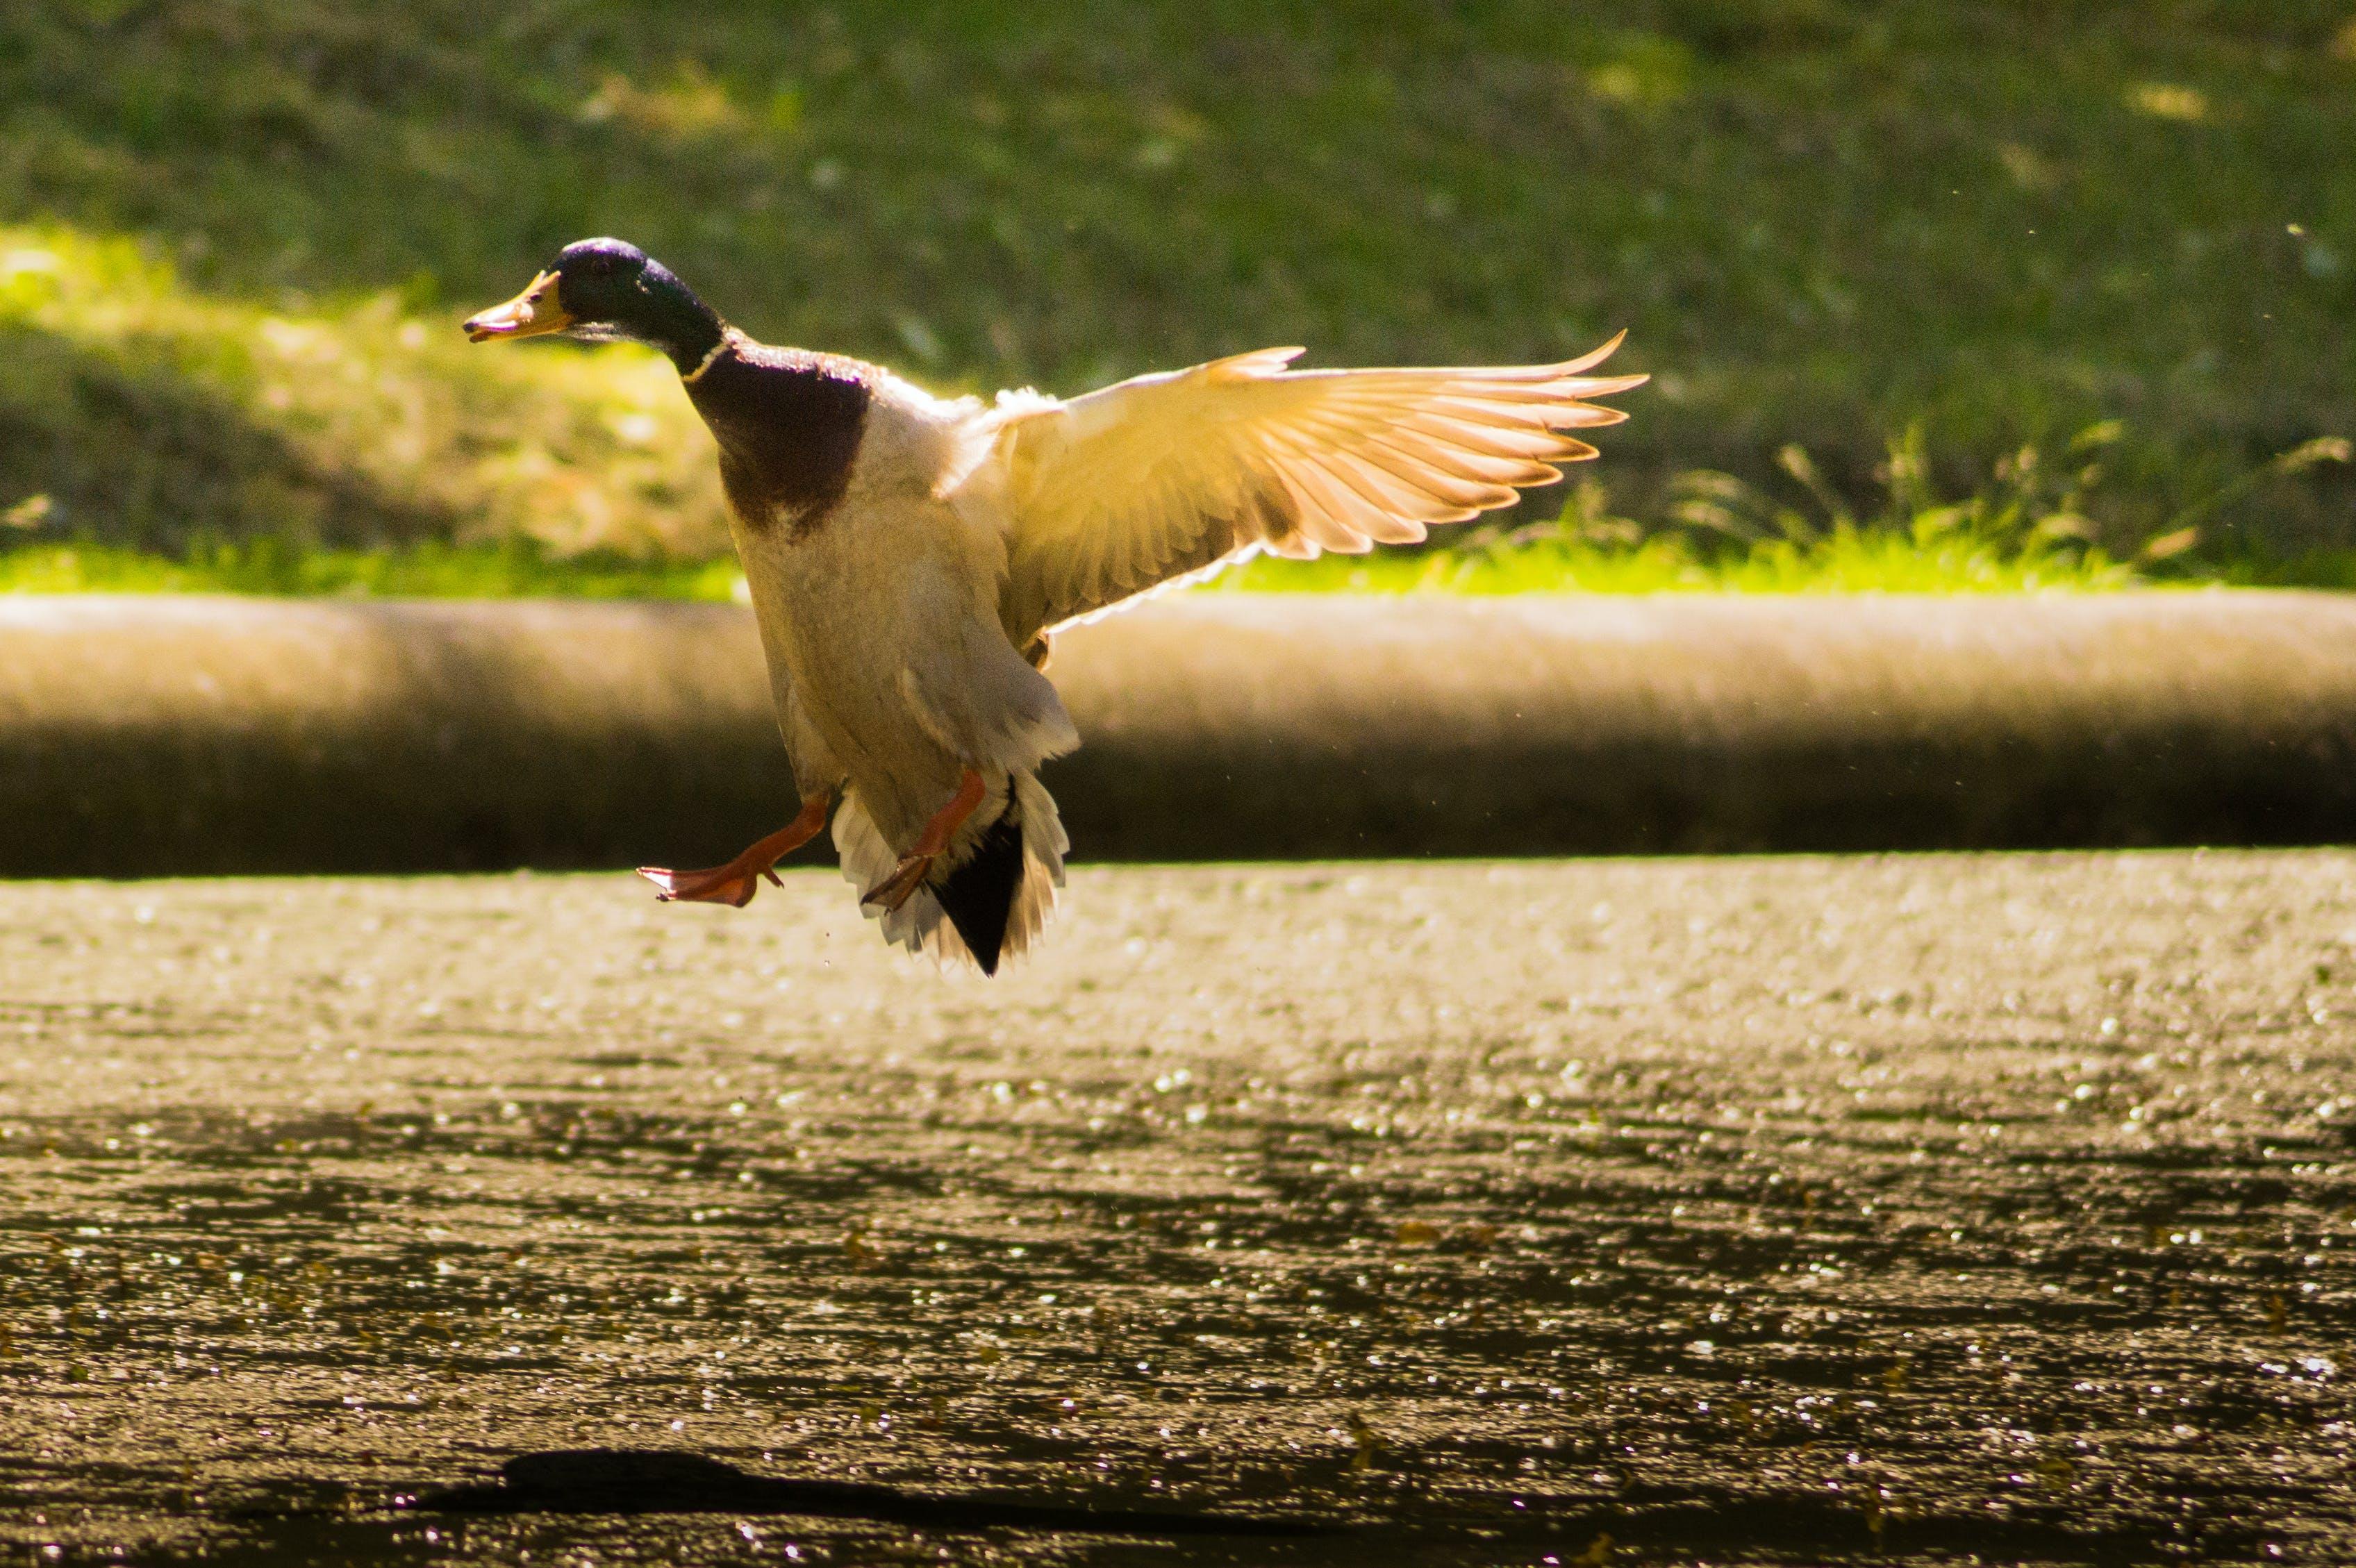 Free stock photo of nature, flying, animal, lake